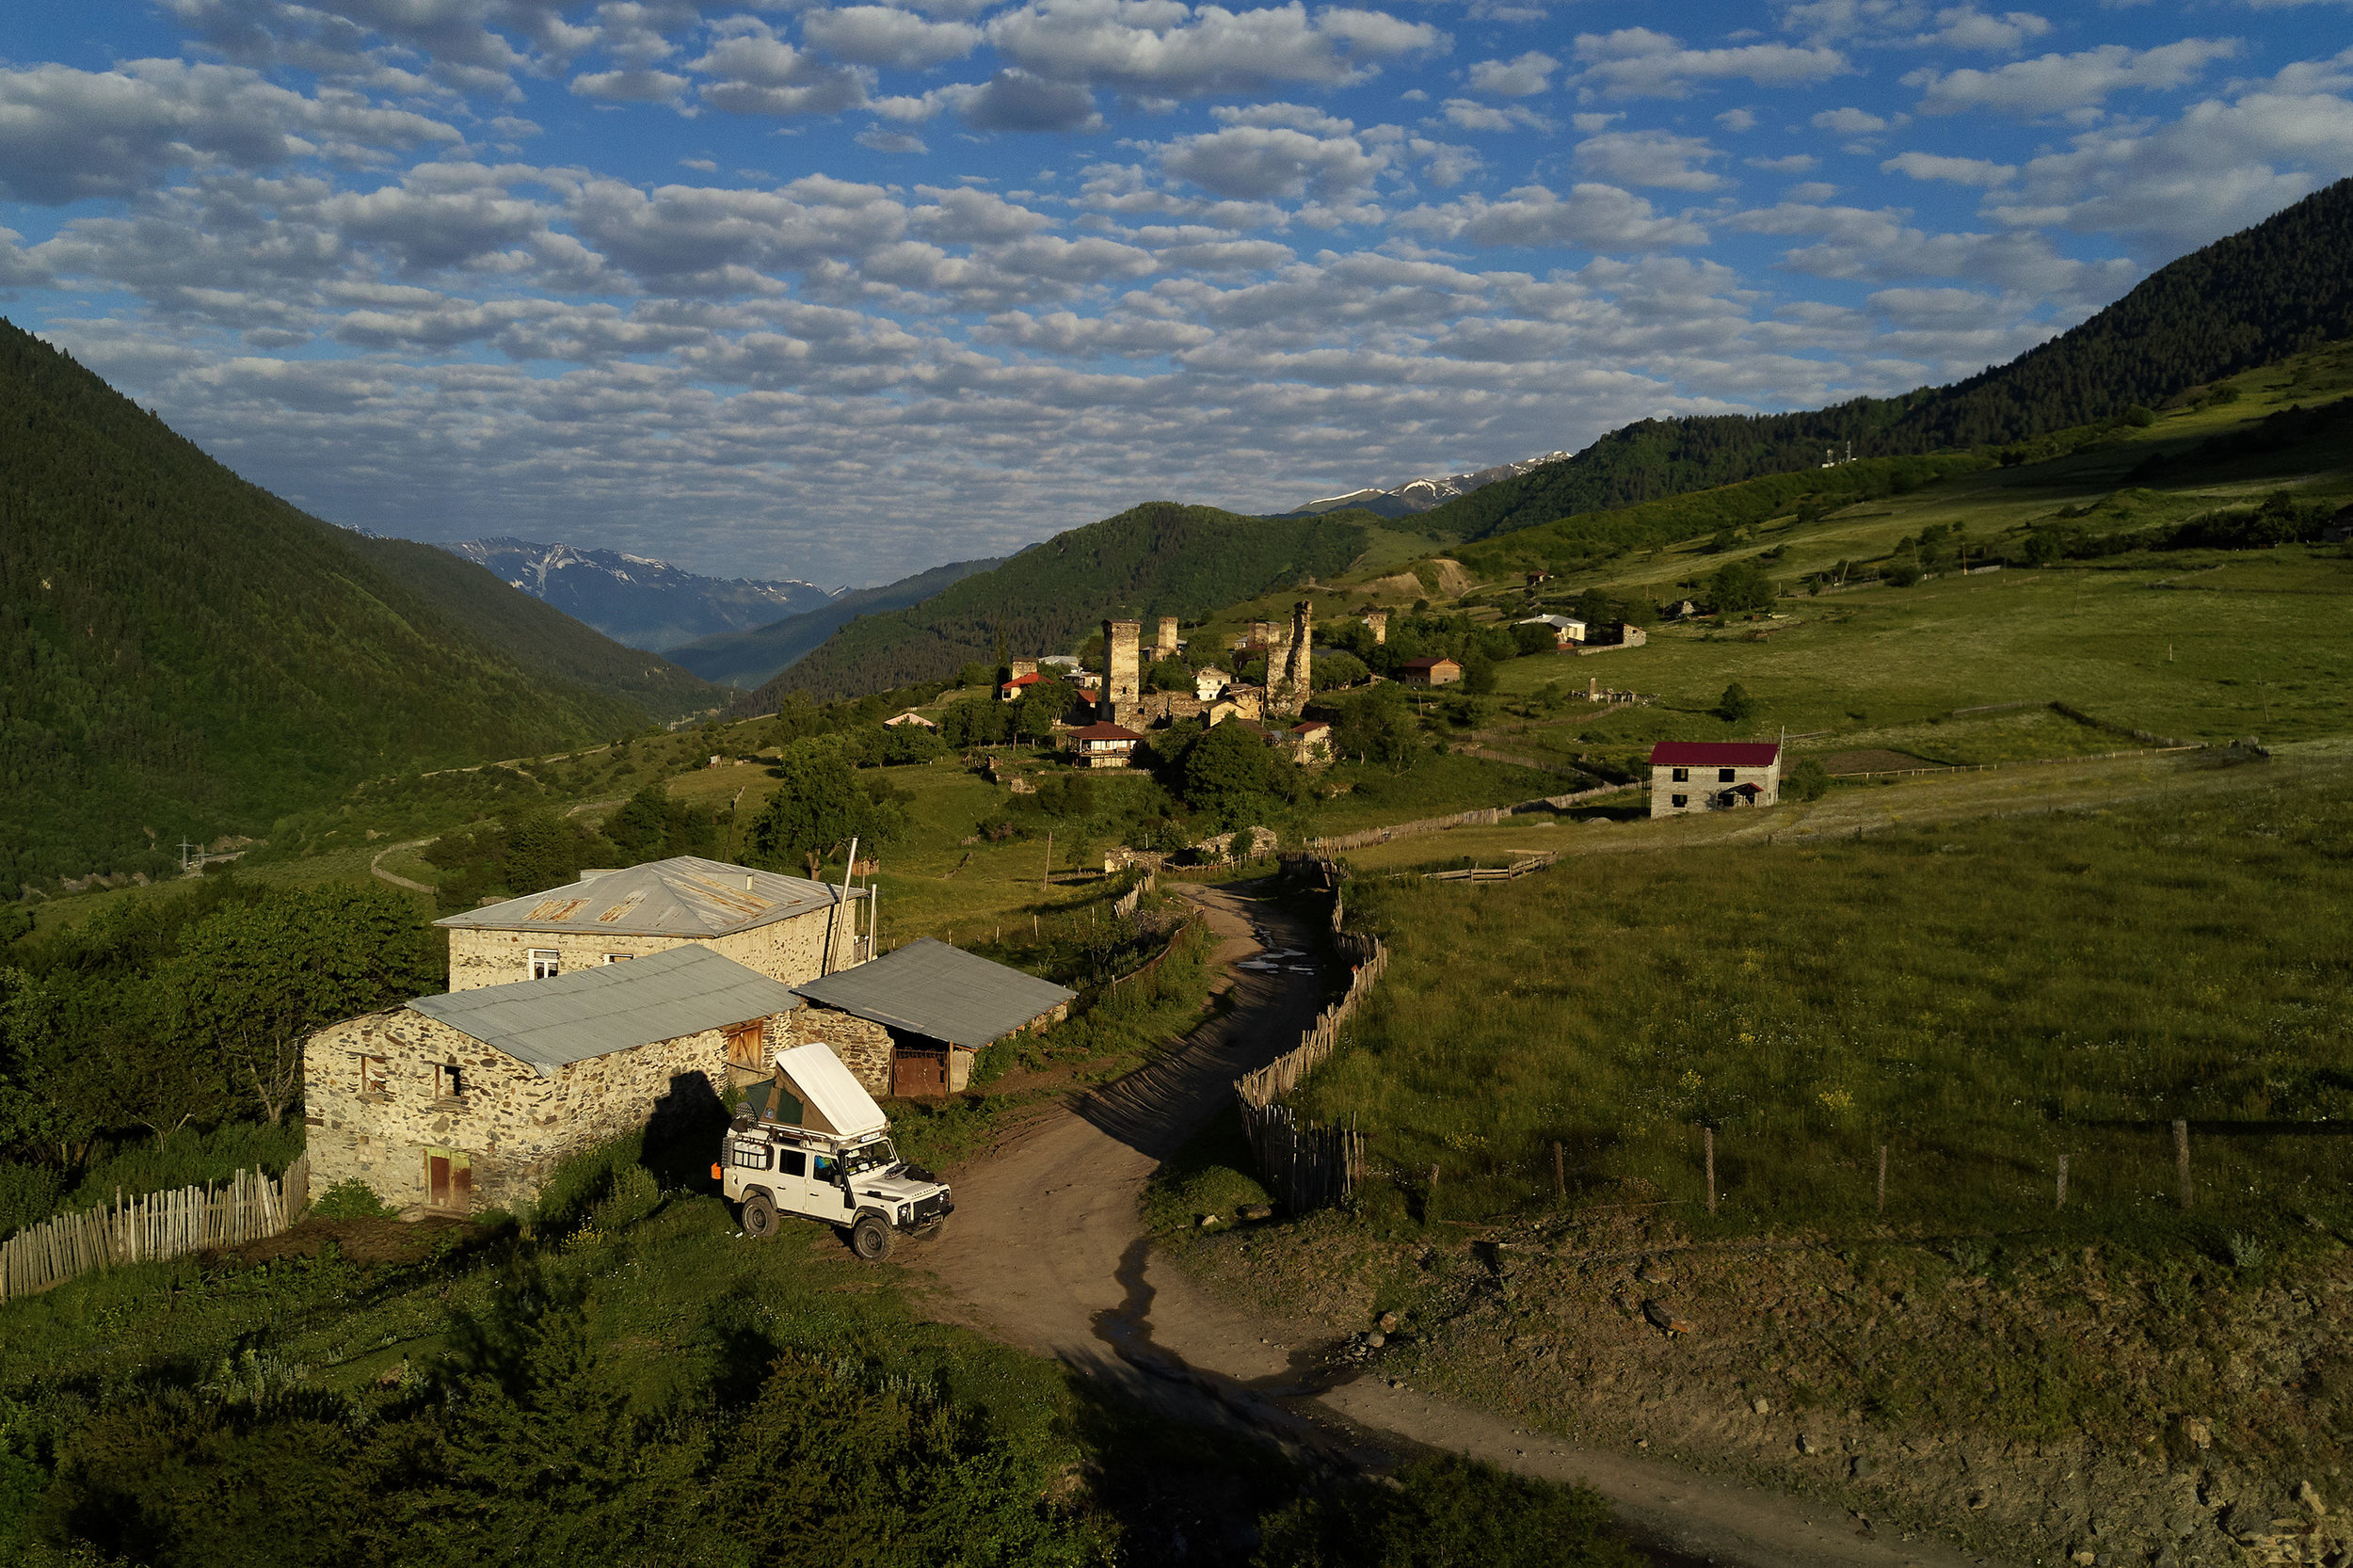 Svaneti-Landrover-in-a-village